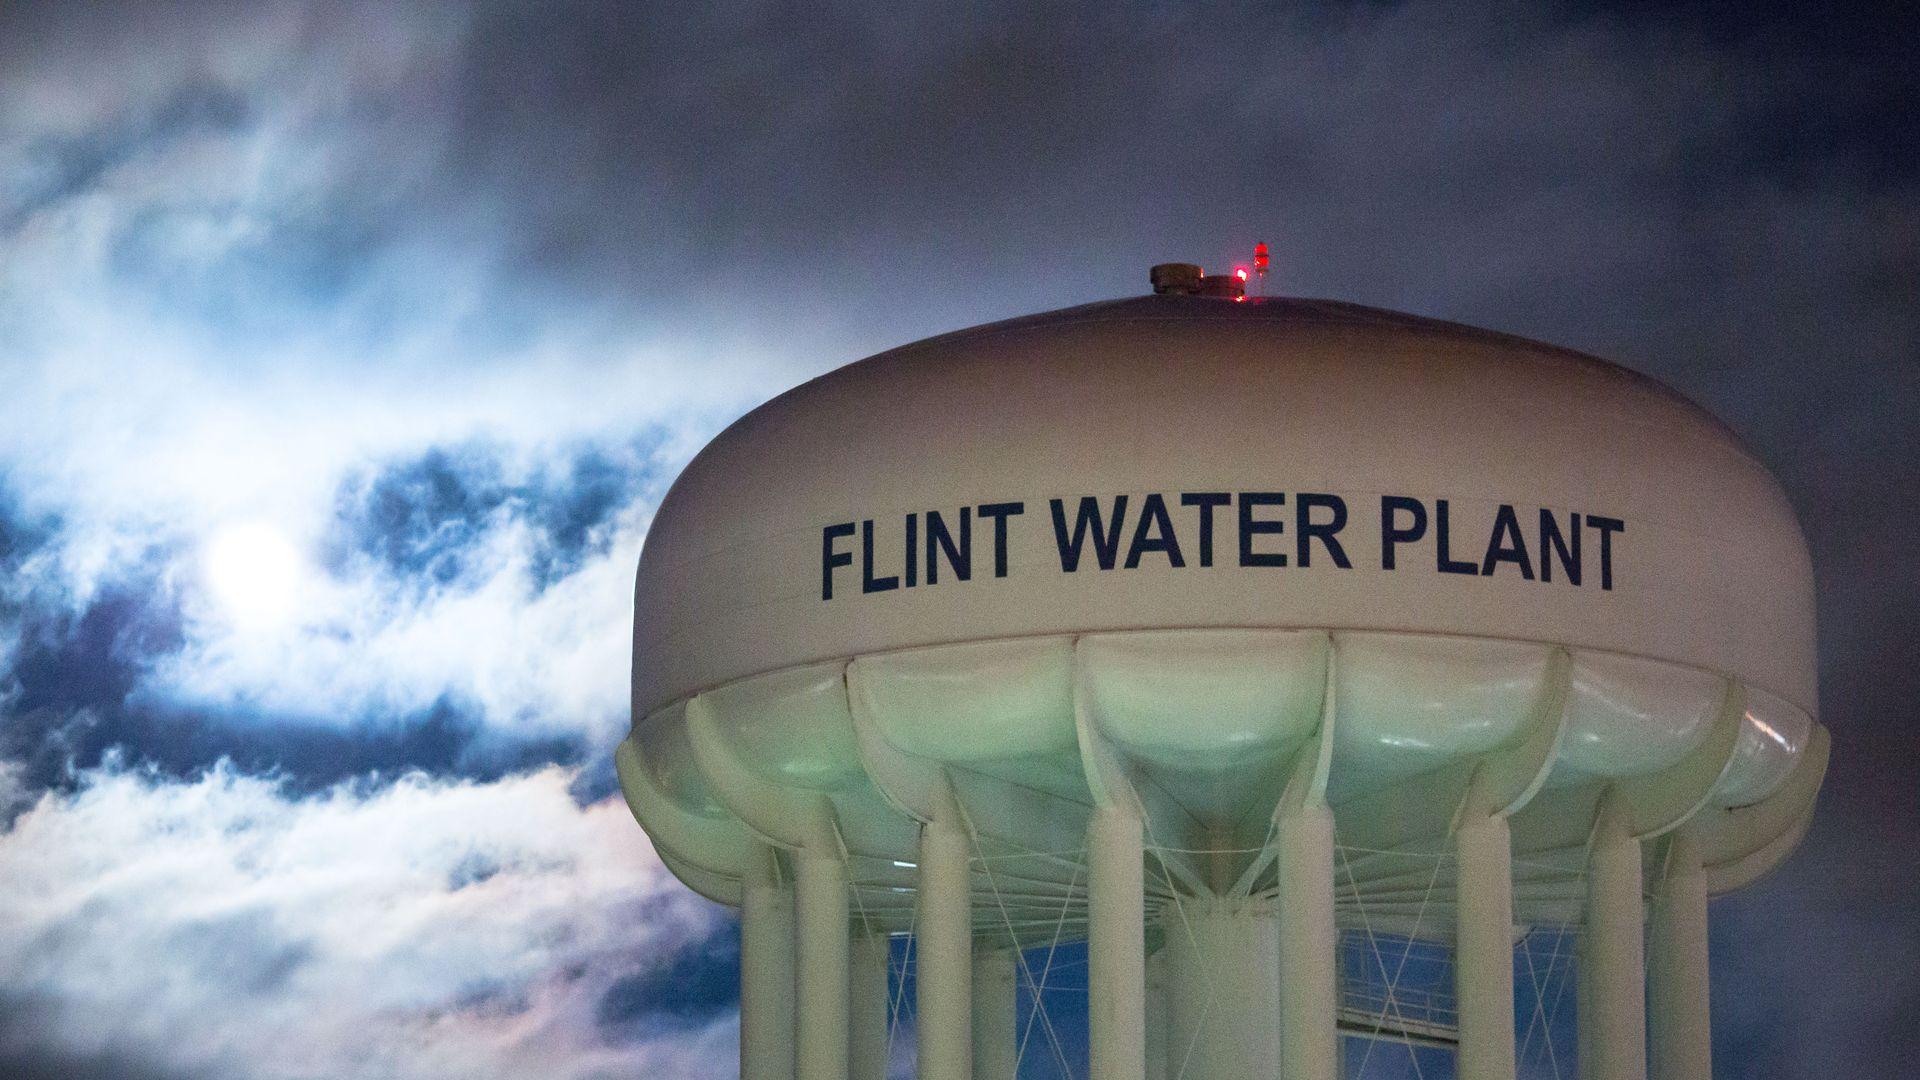 Water plant in Flint, Michigan